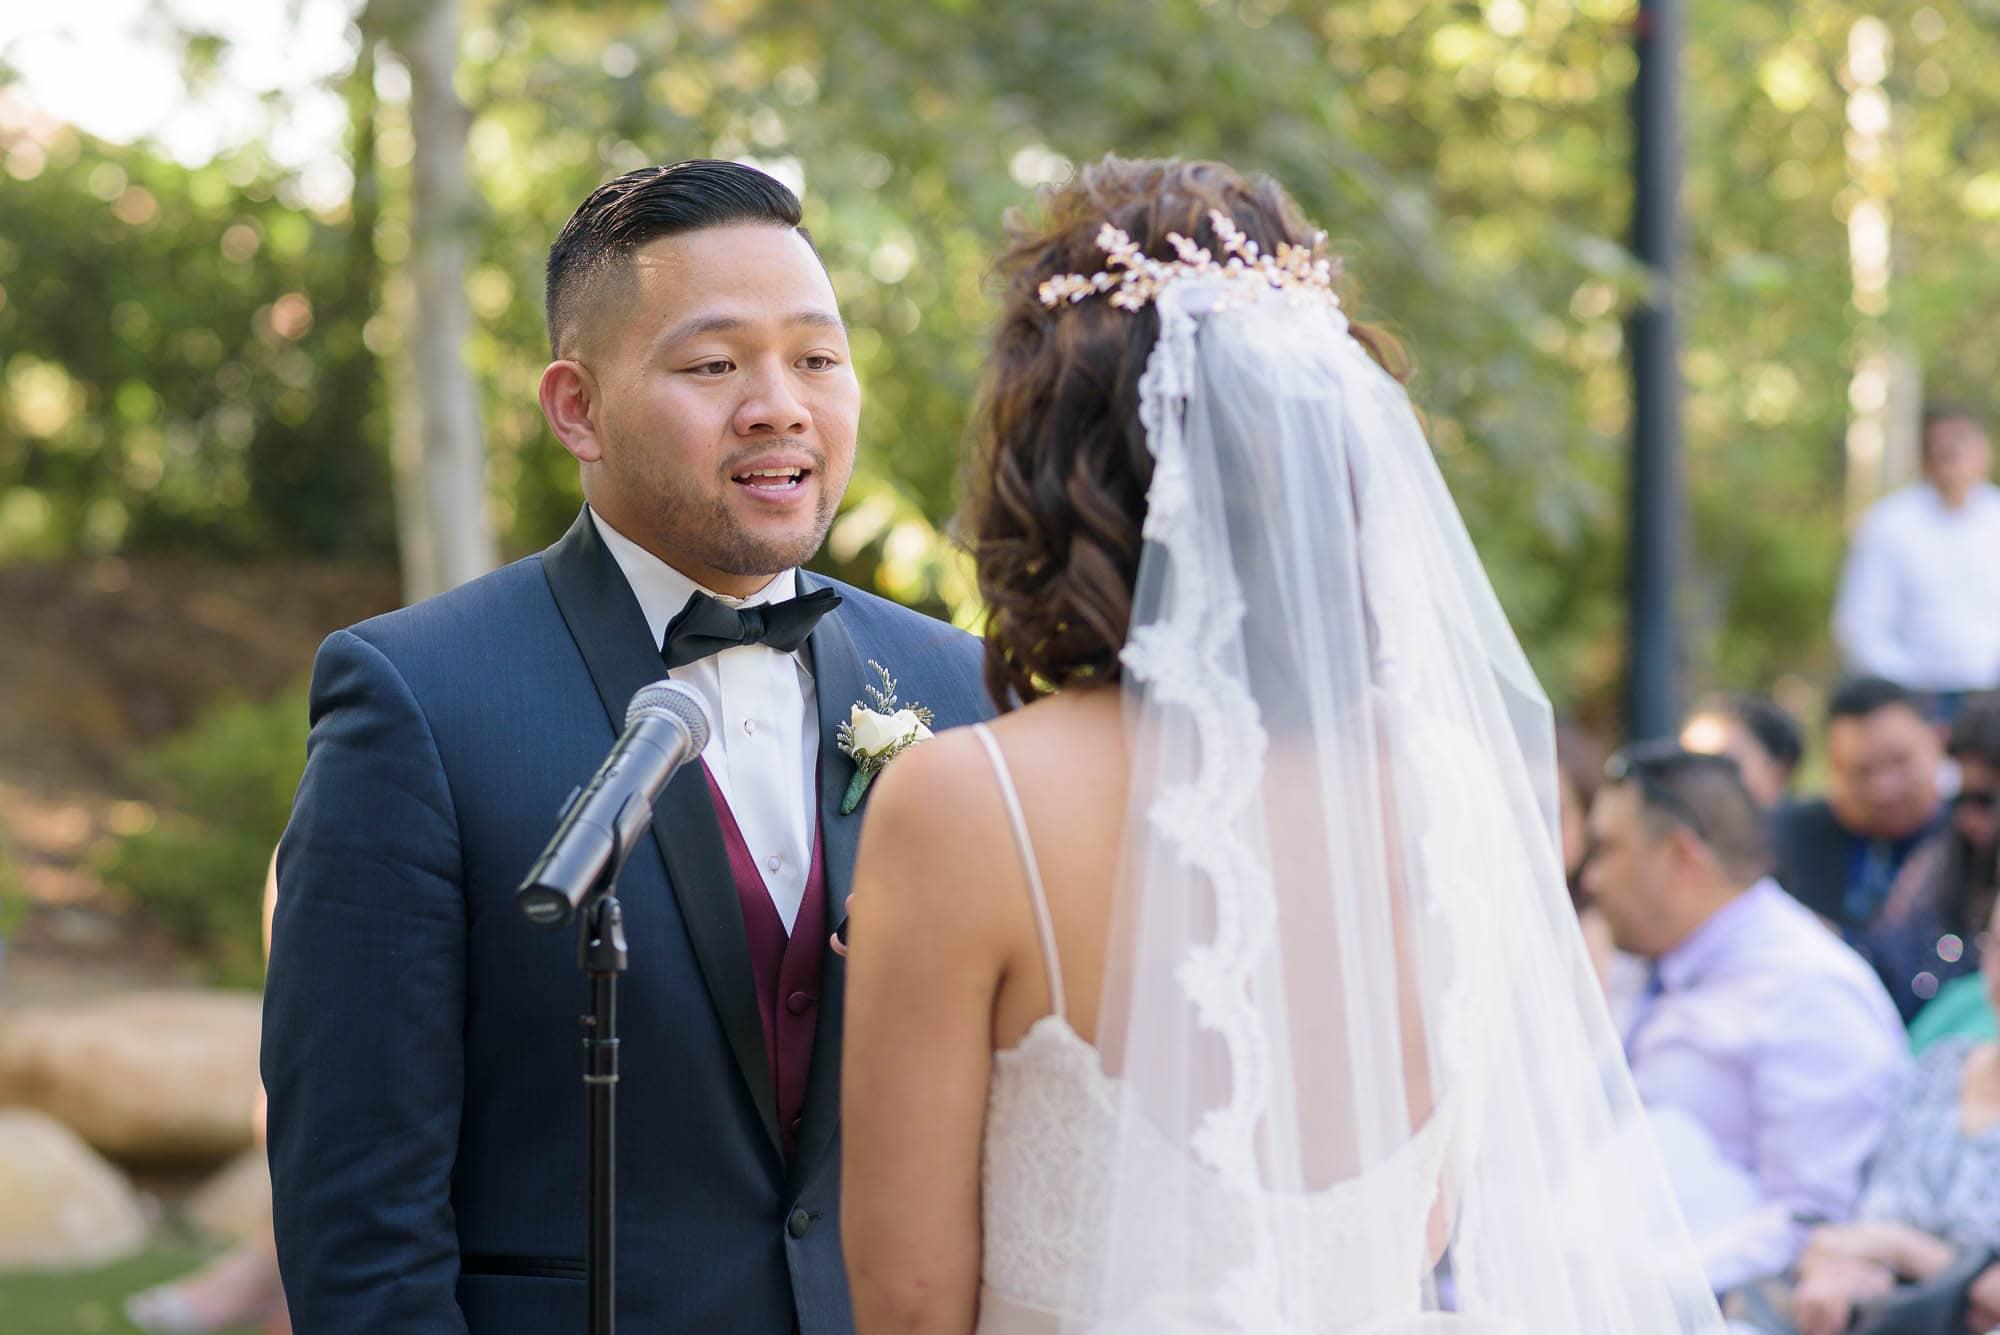 021_Alan_and_Heidi_Wedding_Karla_Paolo